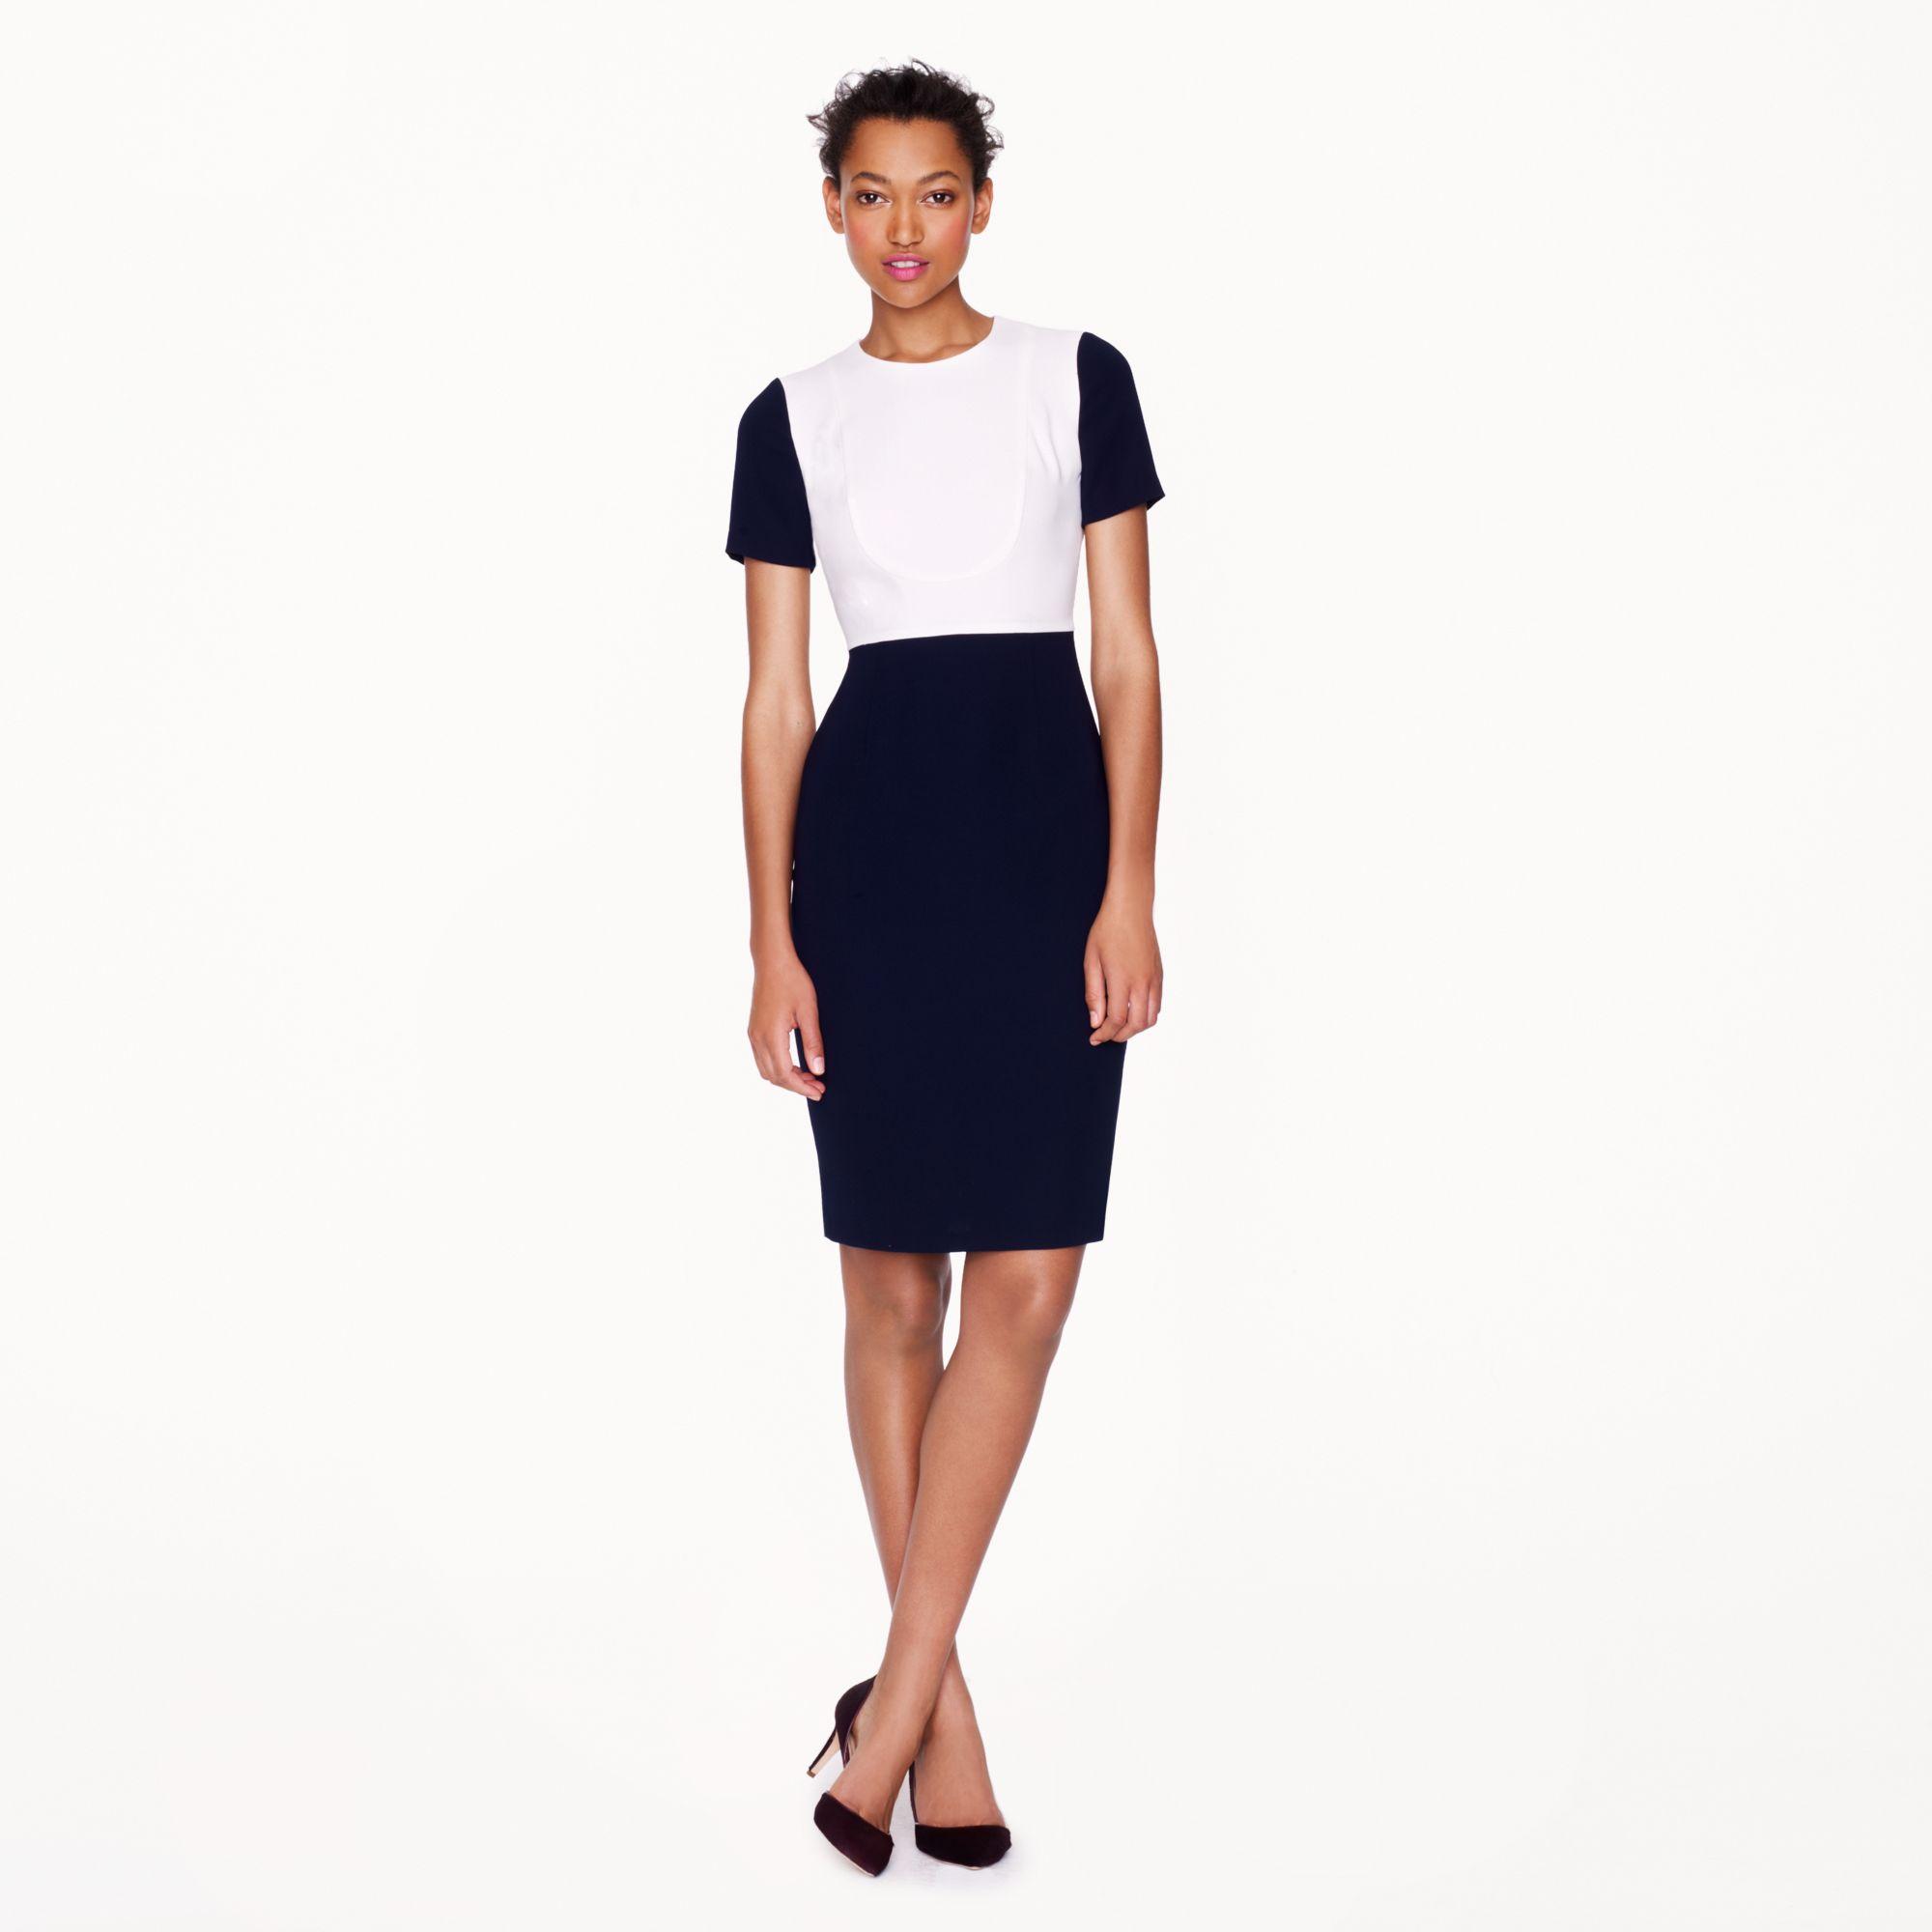 Colorblock Work Dress